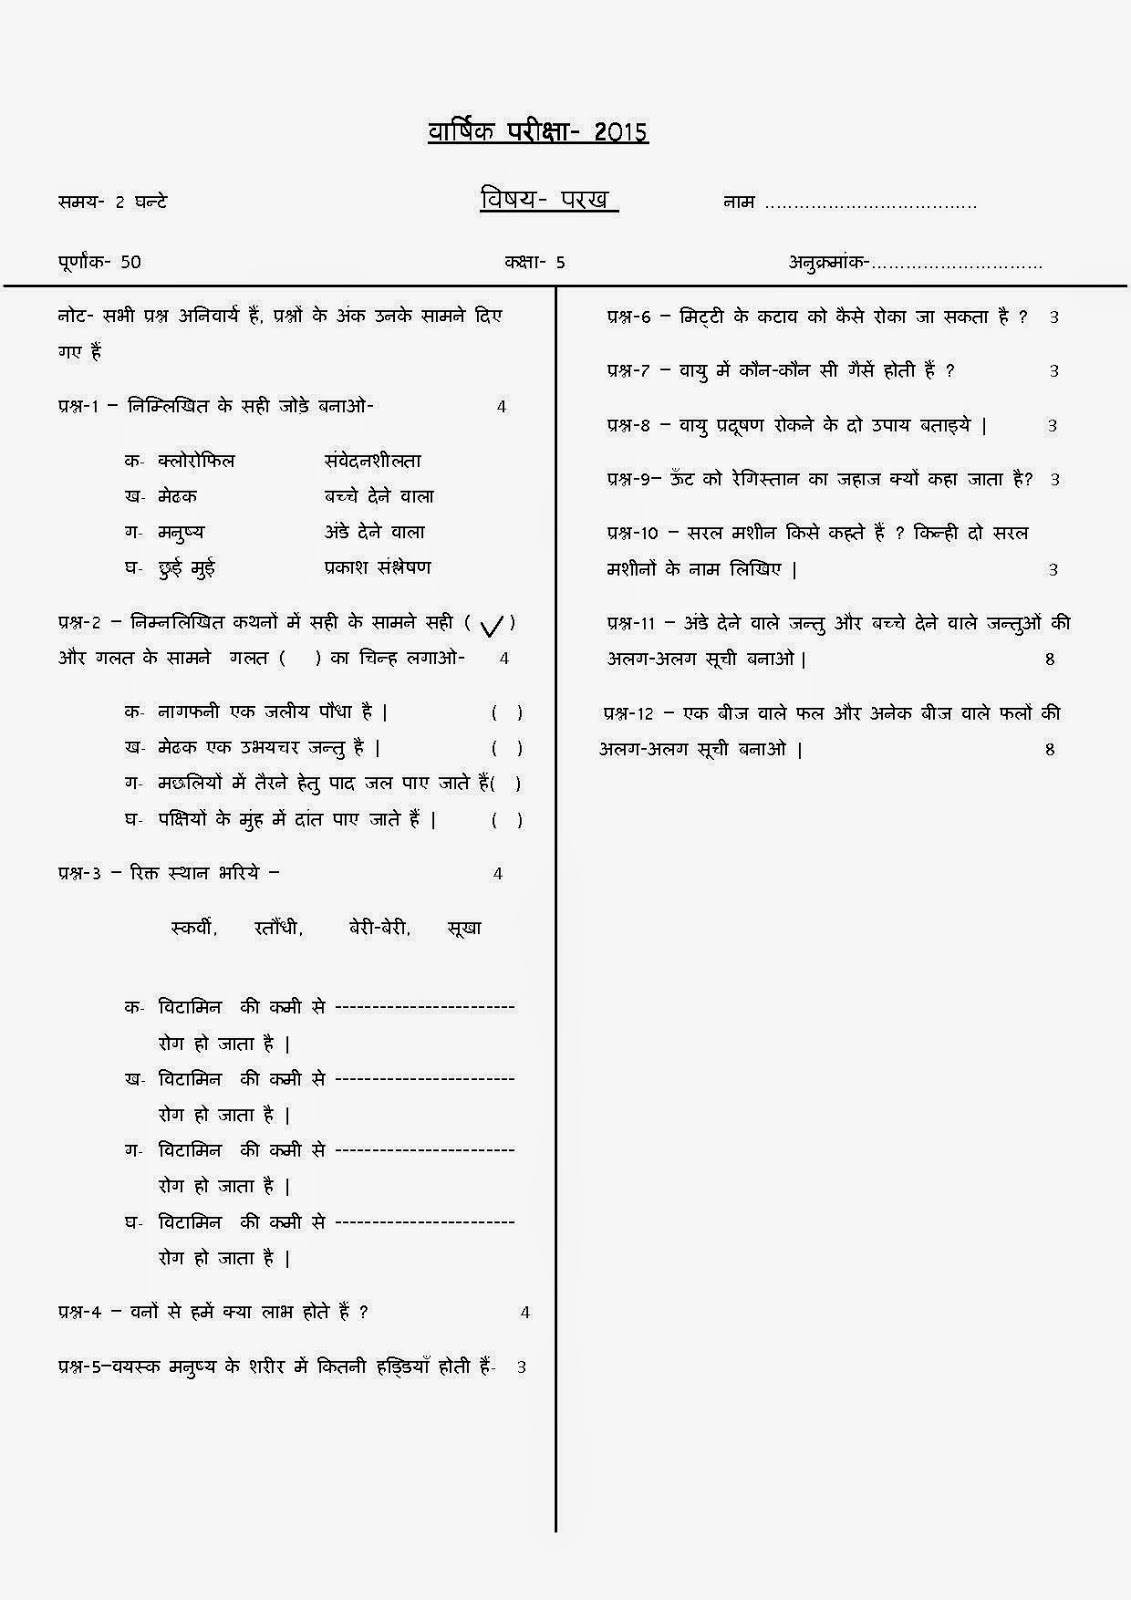 2015 schedule pdf exam board up